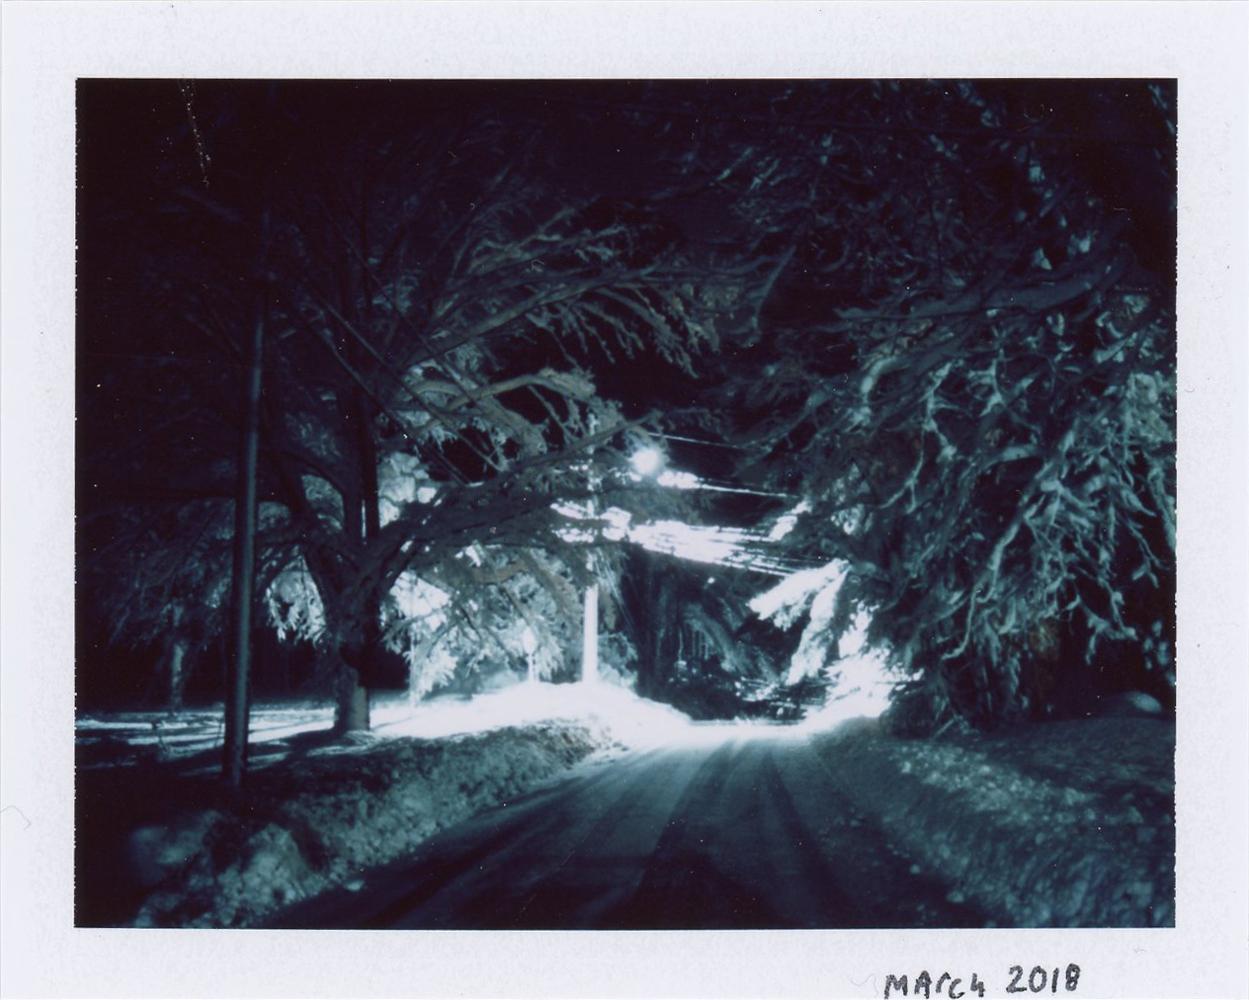 Snowstorm, 2018